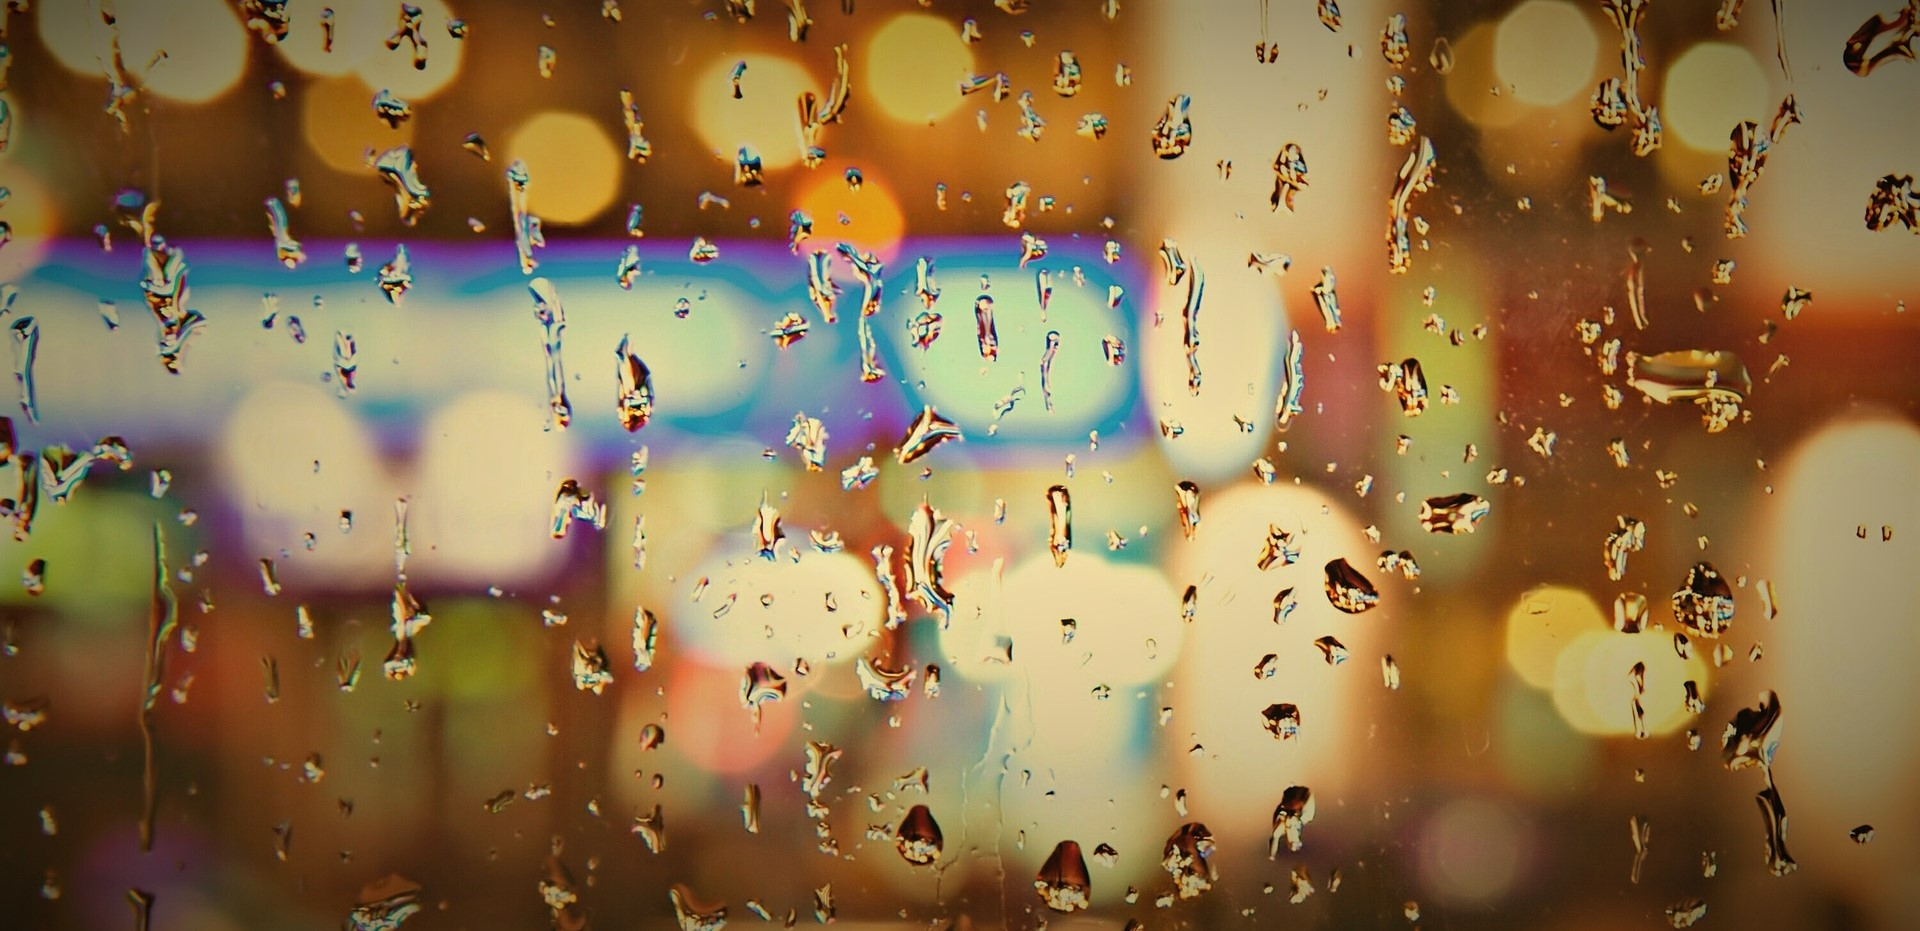 rain-958992_1920 (2).jpg